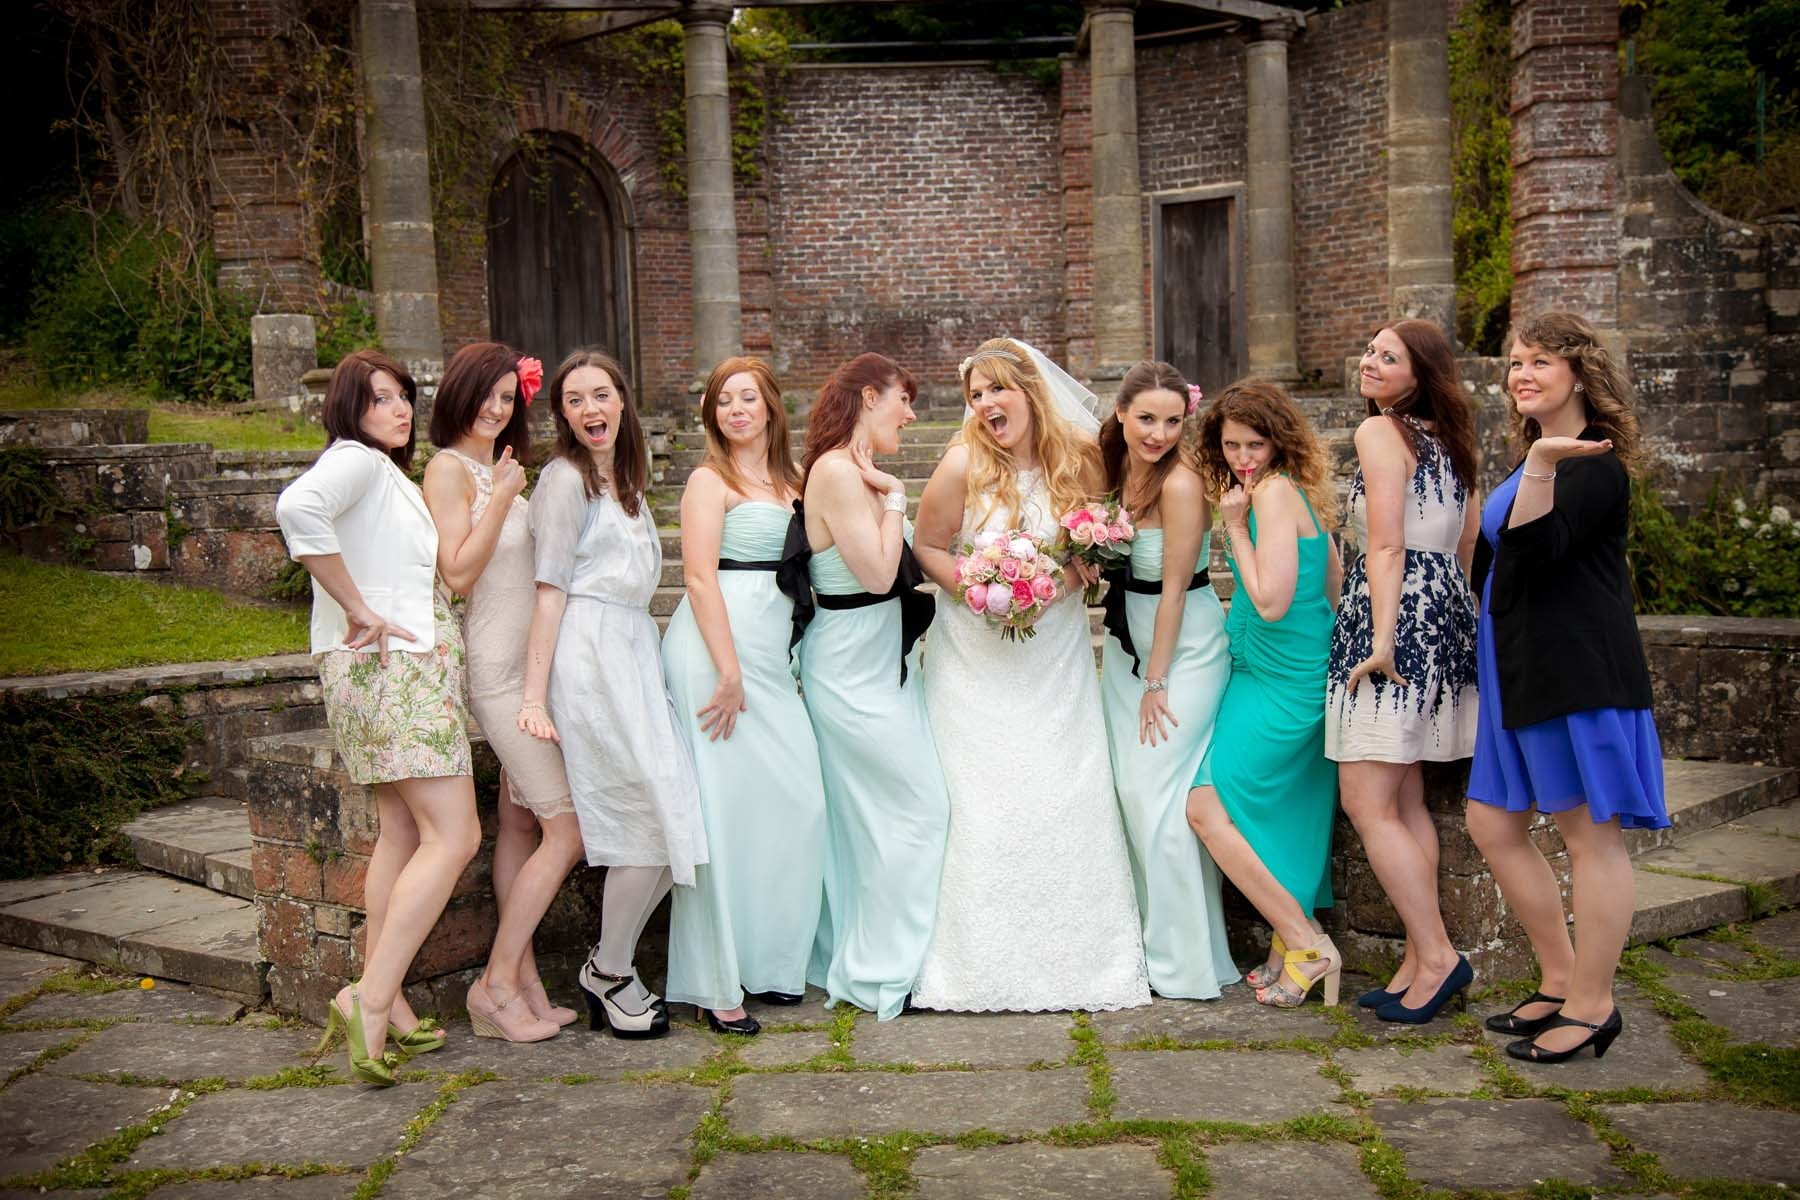 Sussex & Surrey Wedding Photographer - Guests & Groups (9)